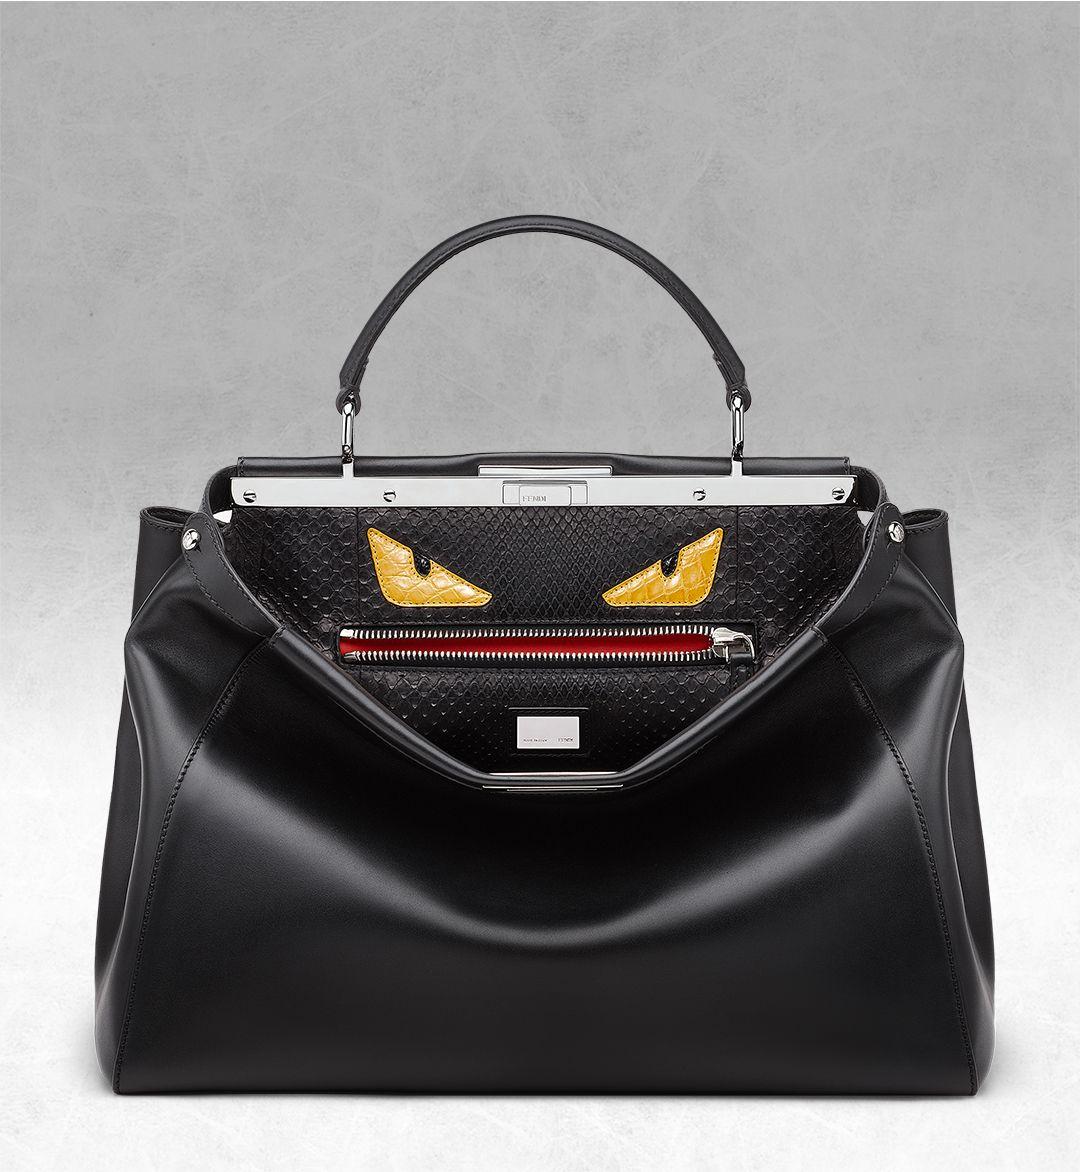 Fendi Peekaboo Monster Handbag Leather With Fur Interior Large Ybf4Nx